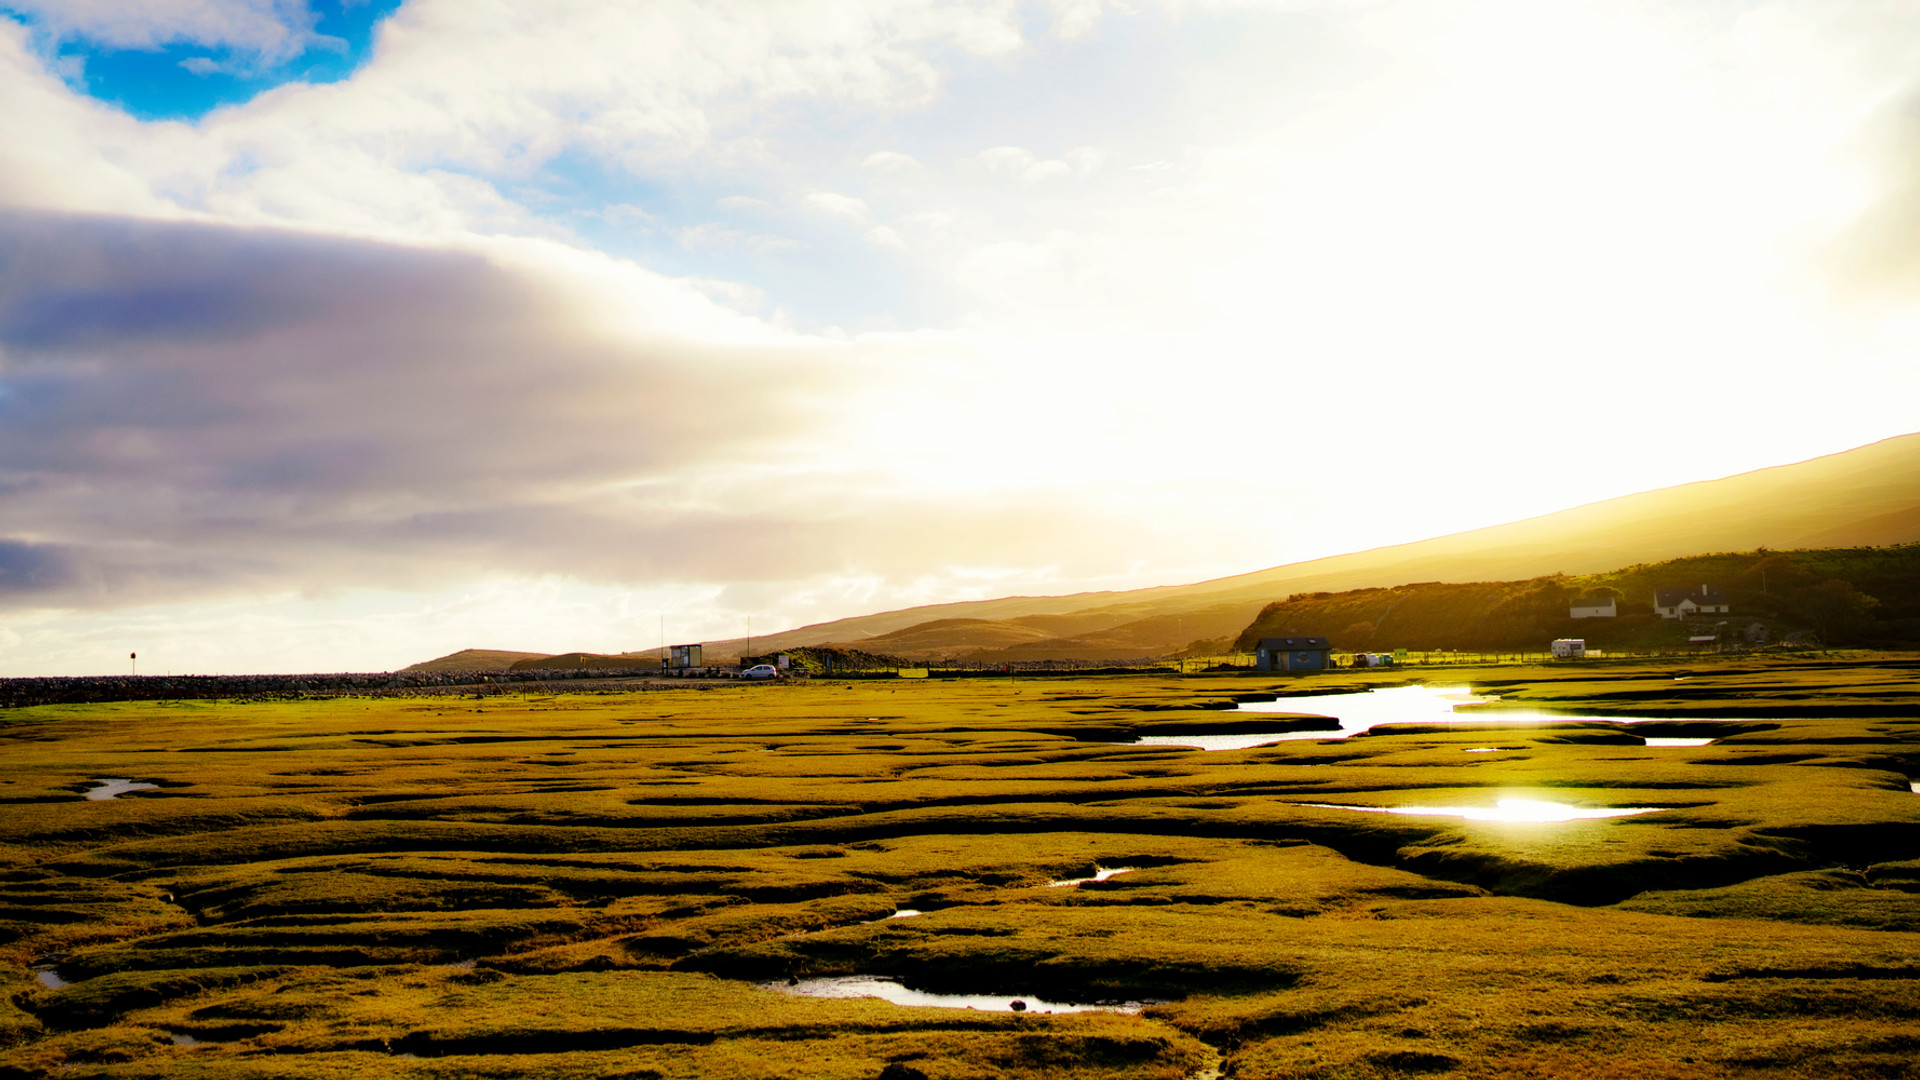 Achill Island, Mayo, Ireland